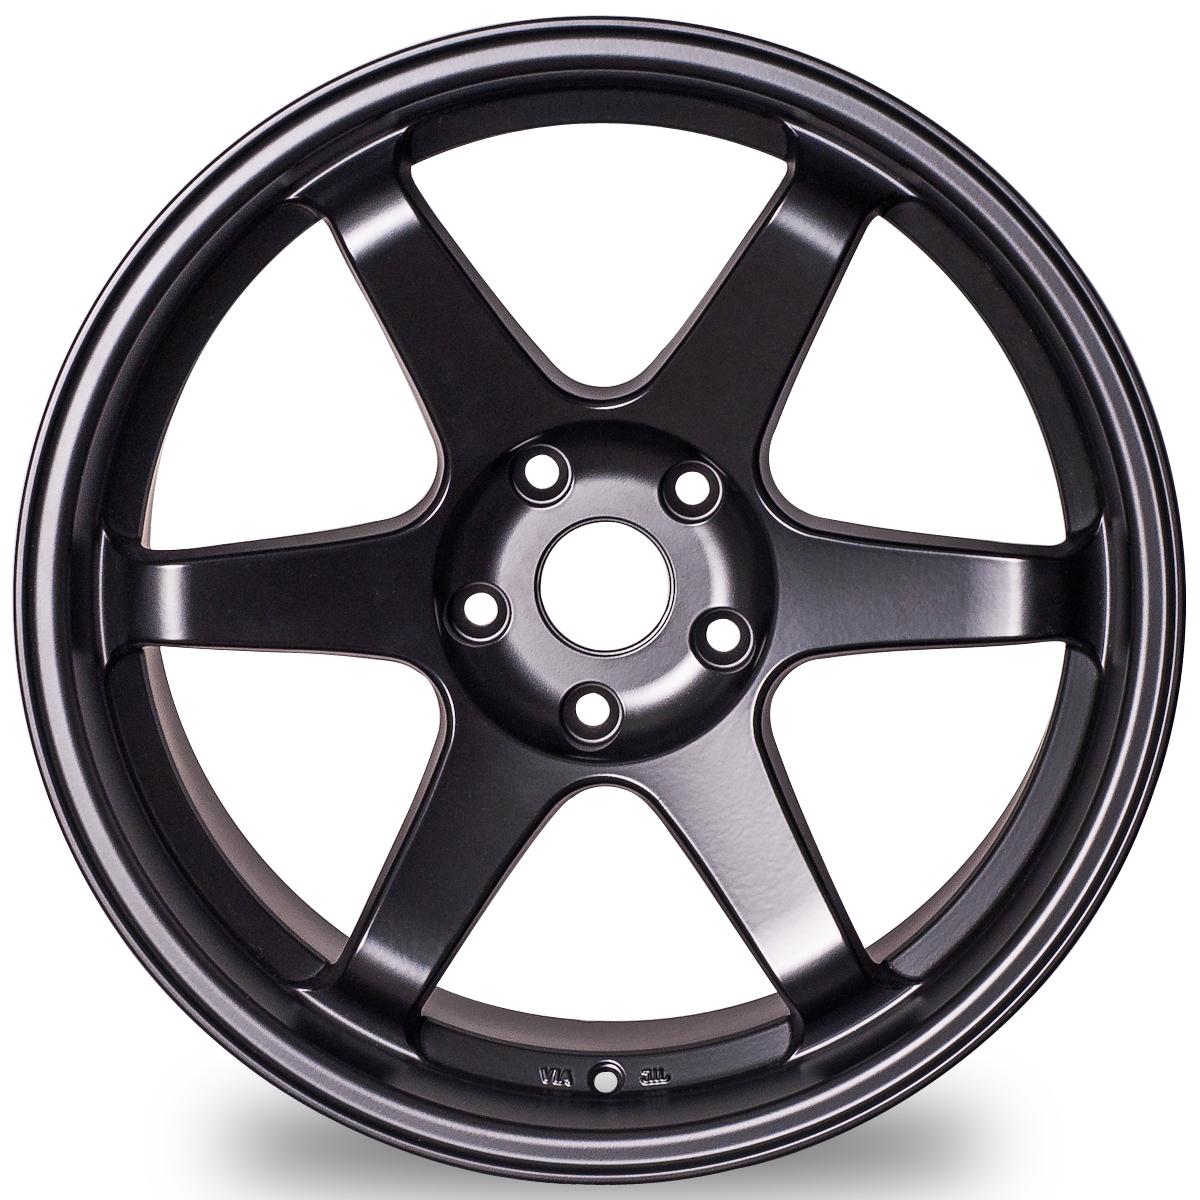 Miro wheels, Miro 112, Custom VW Wheels, 5x100 Wheels, Custom Subaru on audi a4 stock rims, audi s8 black, audi s3 black, audi s6 black, audi a3 black, audi s7 black, audi a7 black, audi b5 black, audi a9 black, audi a4 black, audi s5 black, audi a5 black,